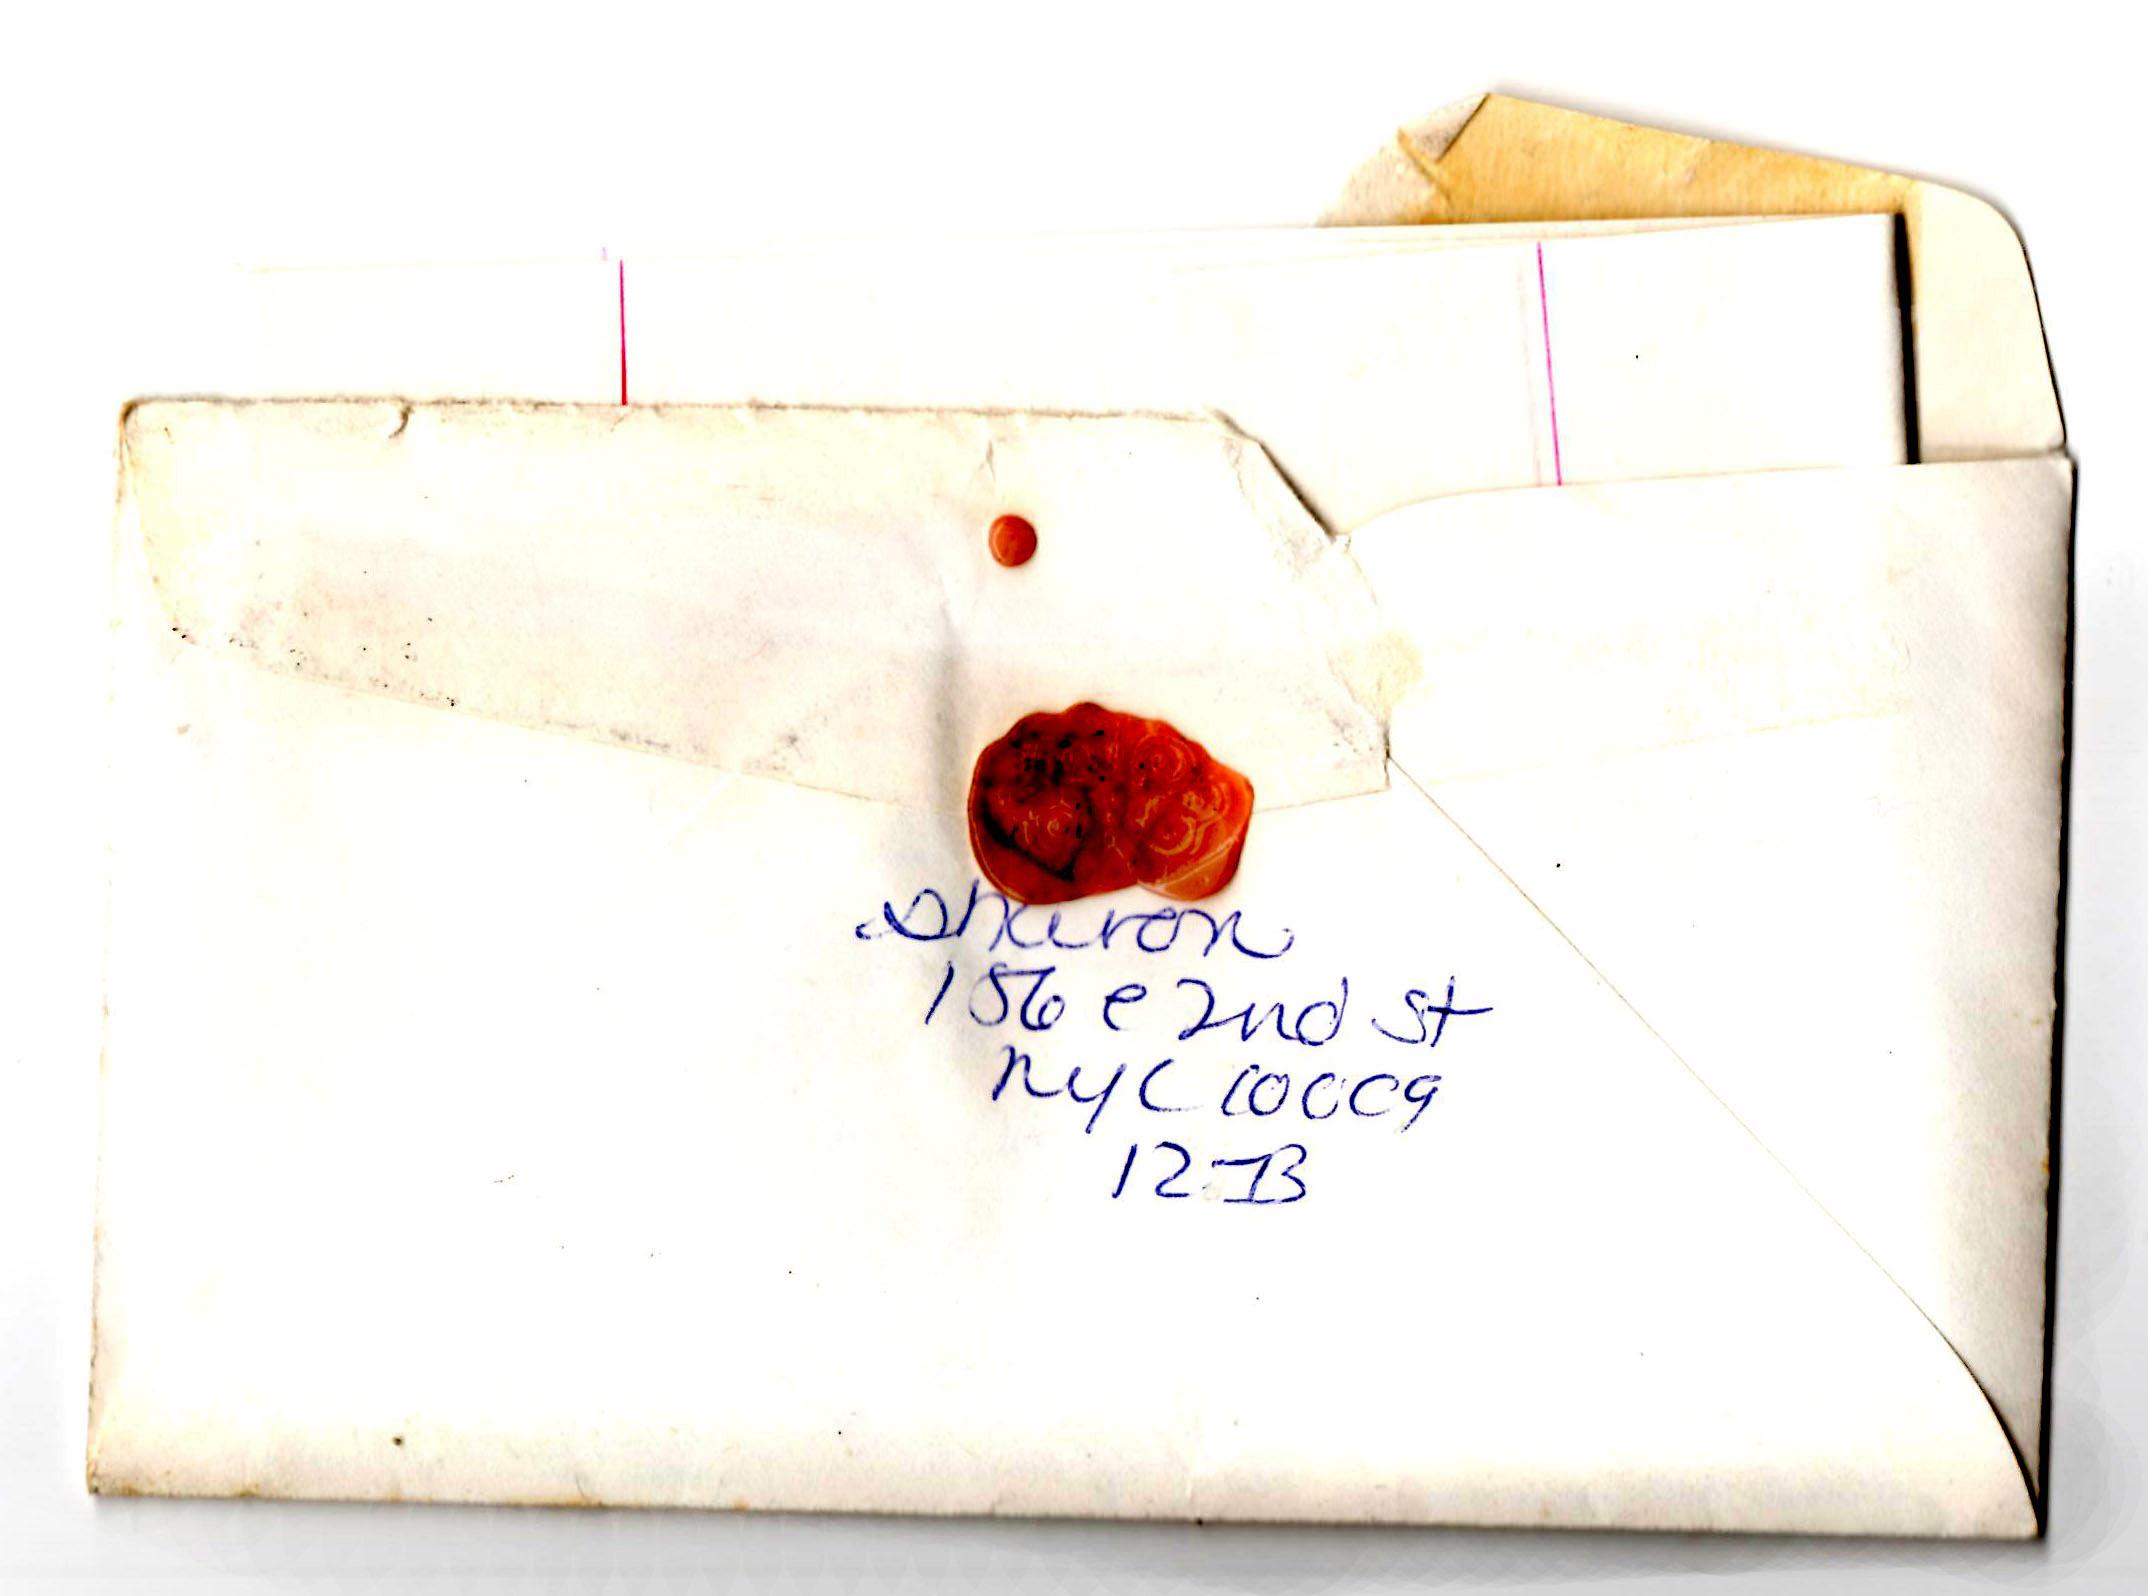 E. 2nd sealing wax